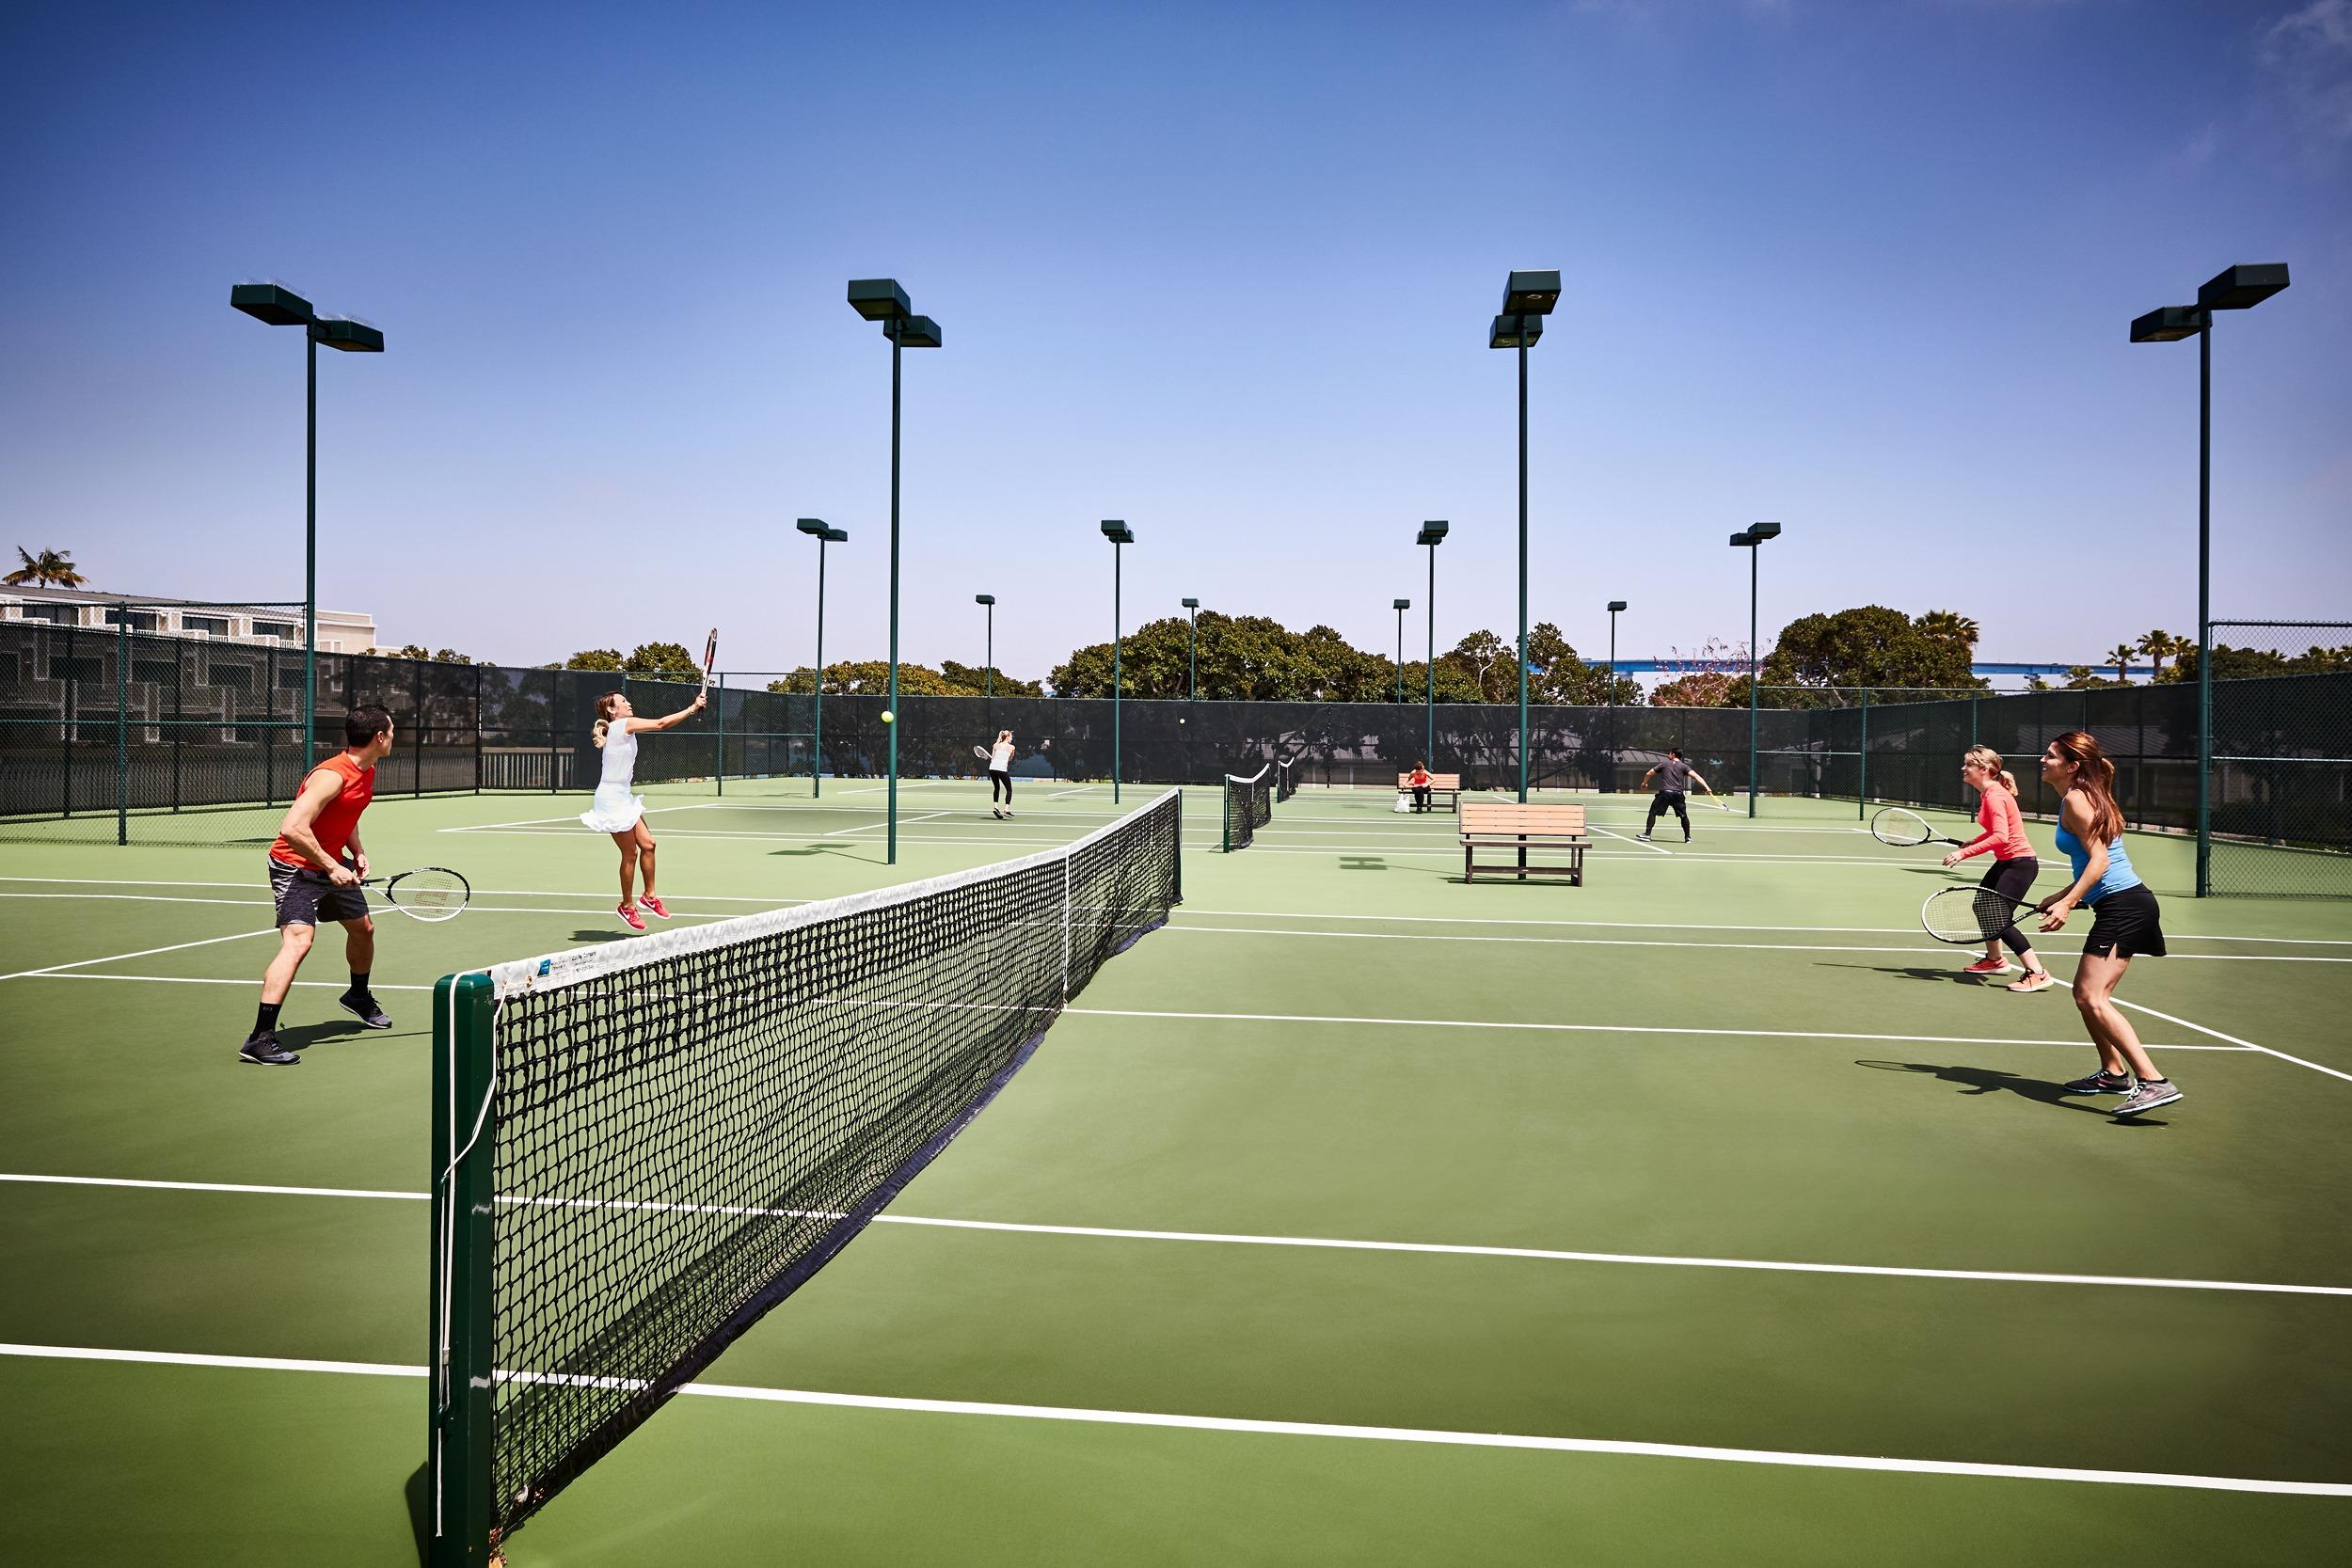 Guests play tennis at Coronado Island Marriott